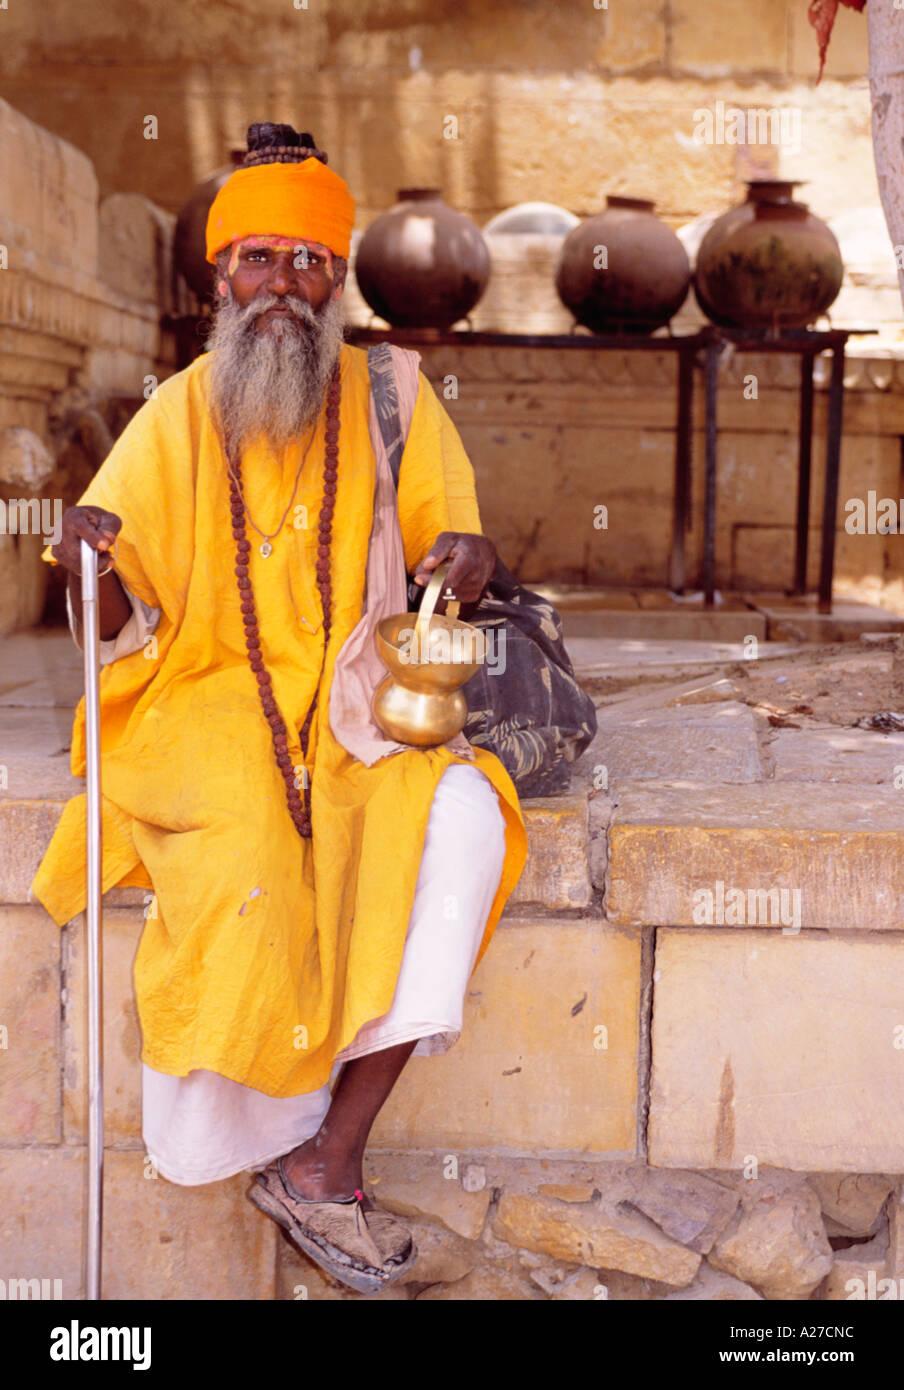 INDIA RAJASTHAN JAISLAMER BEGGAR ON WALL WITH POT - Stock Image